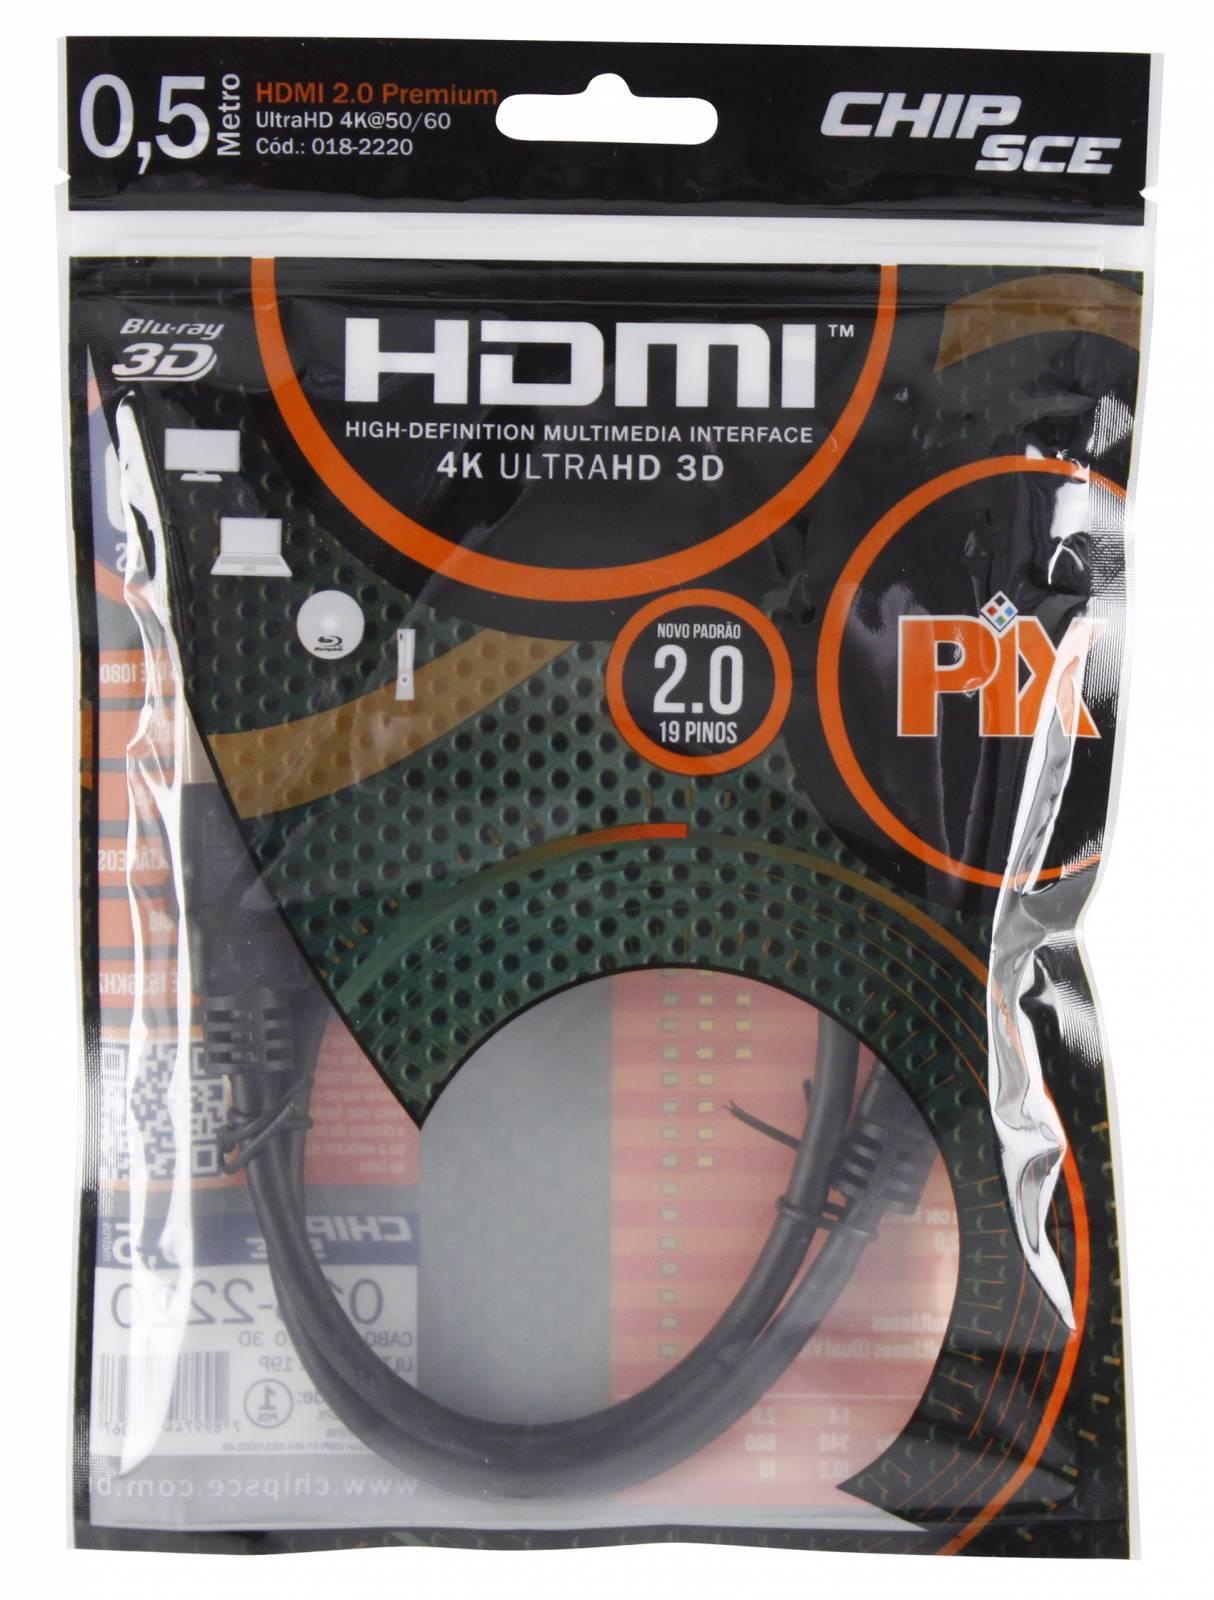 Cabo HDMI 0,5 mt 2.0/3D/4K 19 pinos 18Gbit/s - PIX - Ilha Suportes